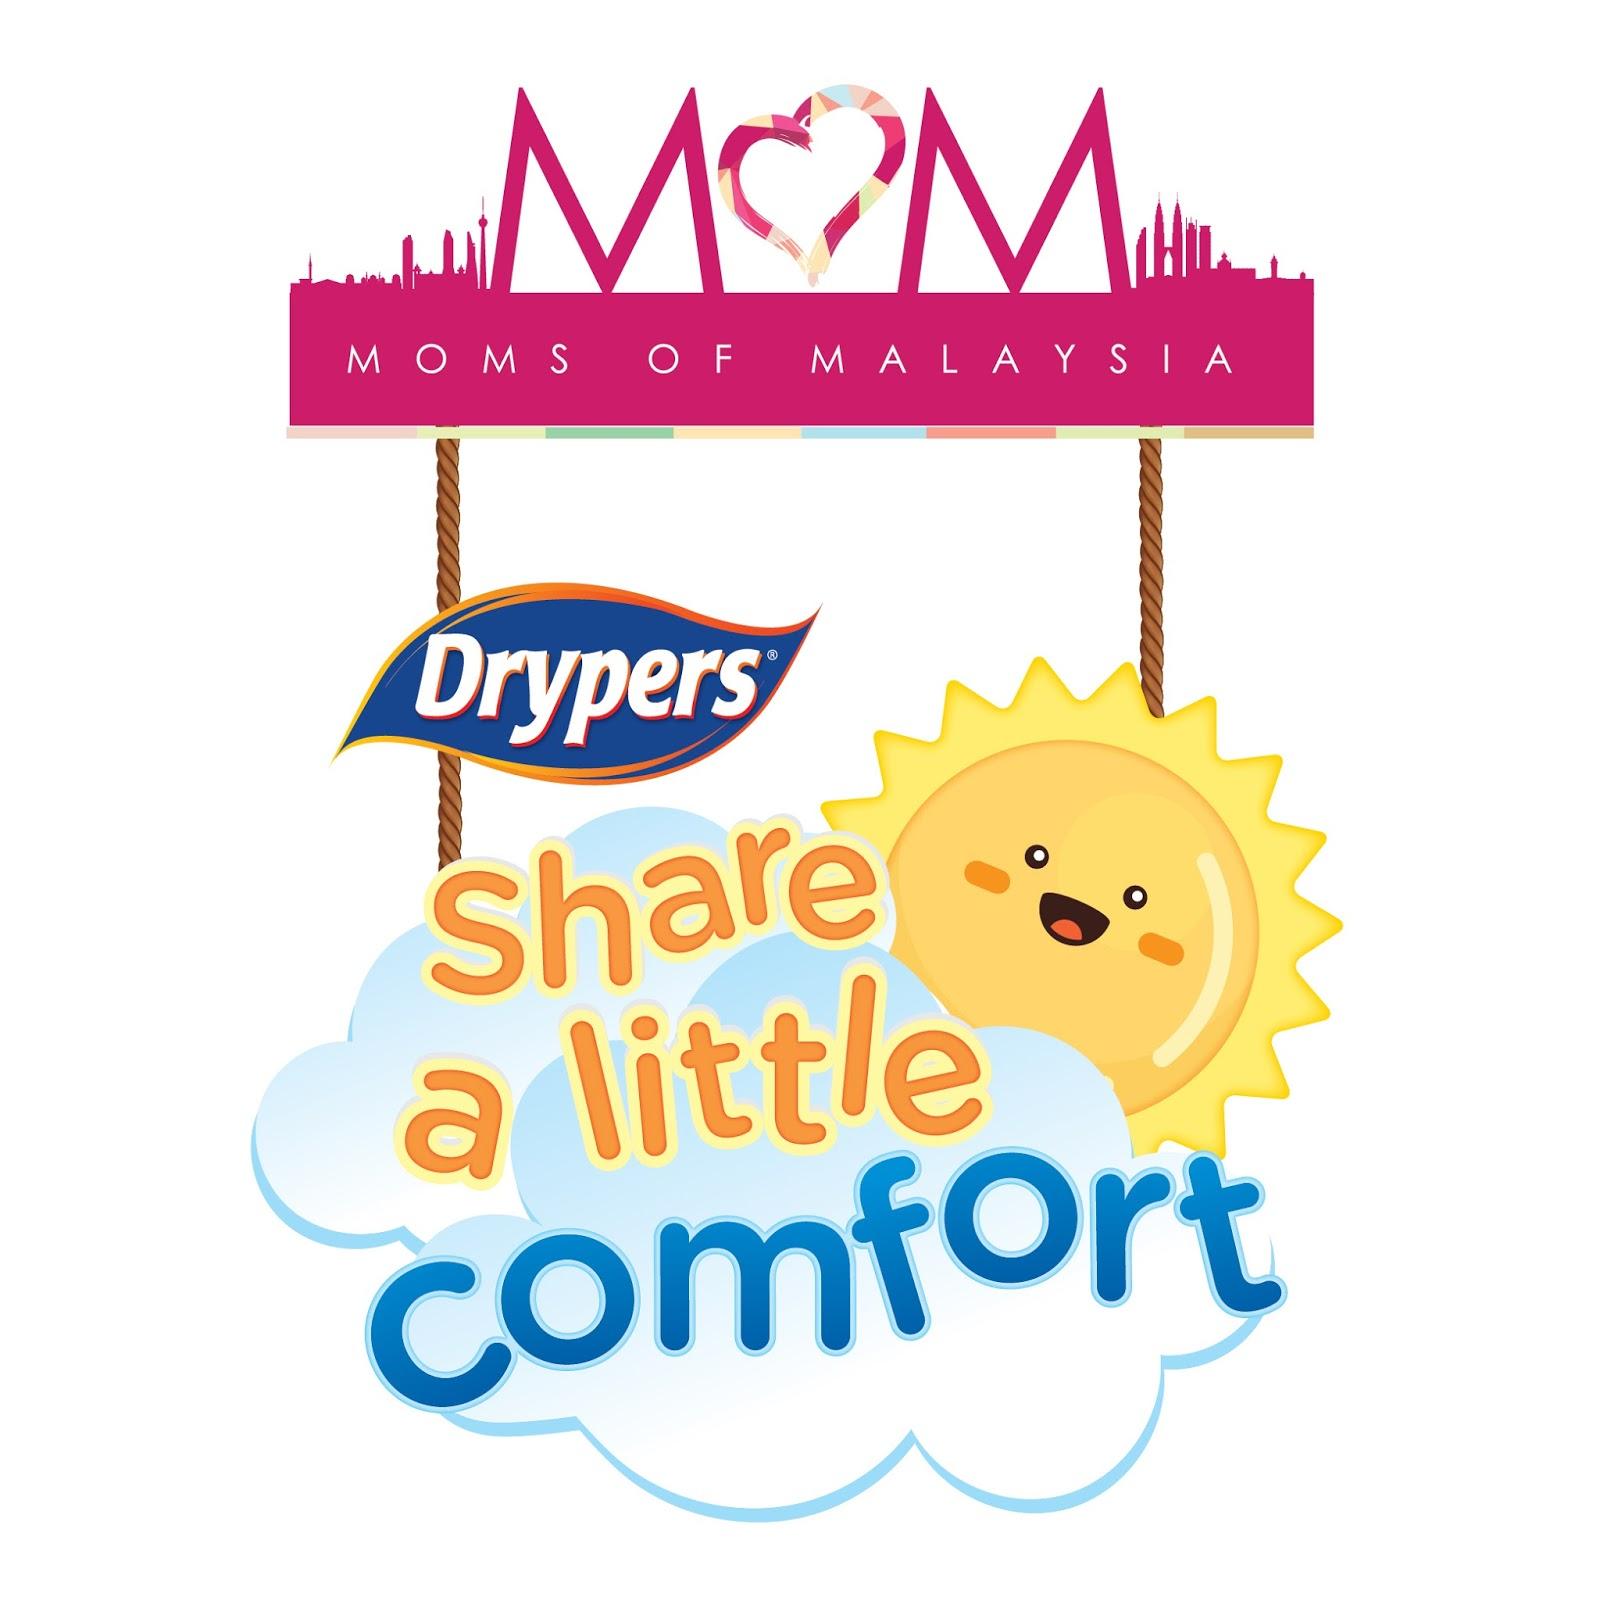 KEMPEN DRYPERS 'MOMS OF MALAYSIA' DAN PROGRAM CSR 'SHARE A LITTLE COMFORT'